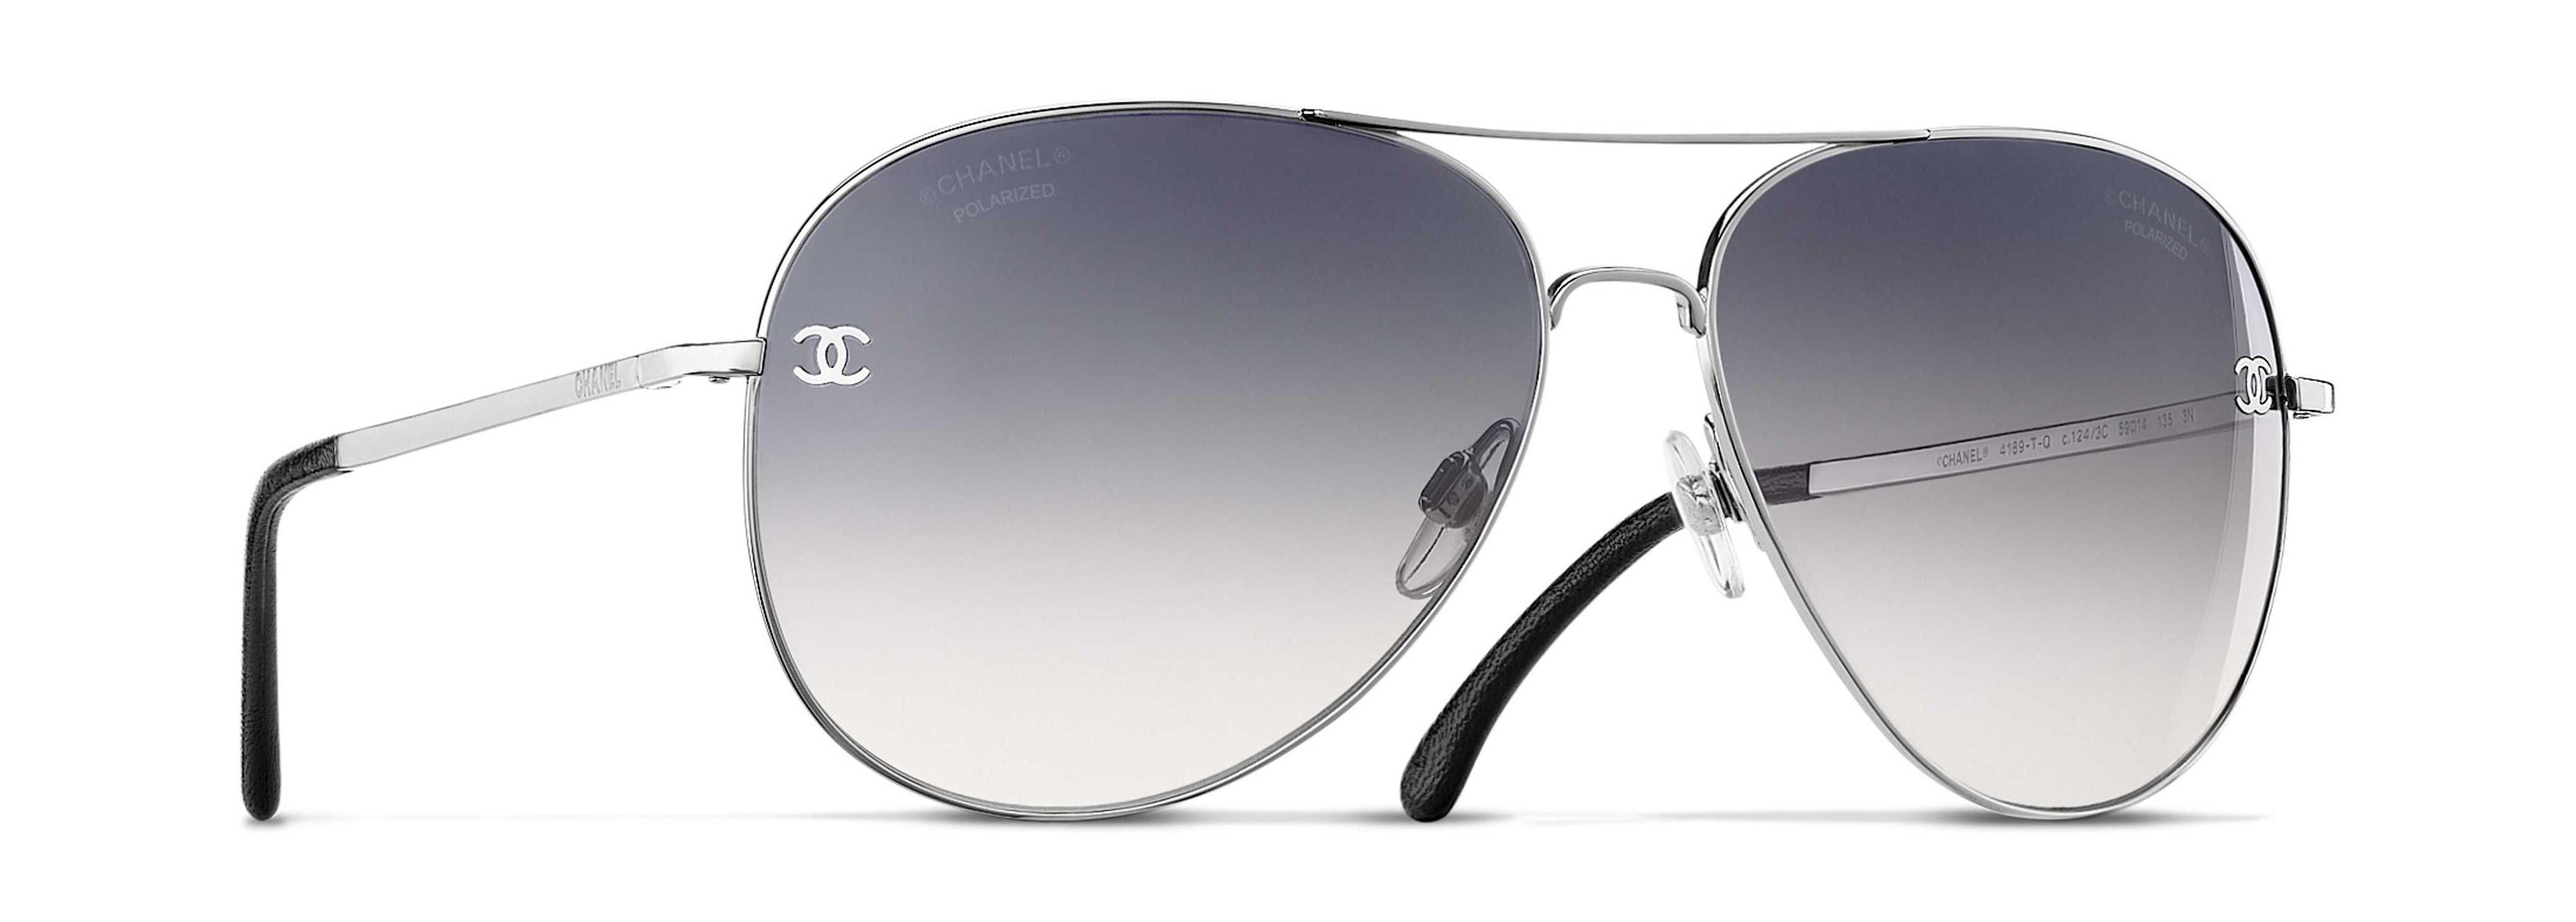 Sunglasses Women CHANEL CH 4189TQ C124S8 59/14